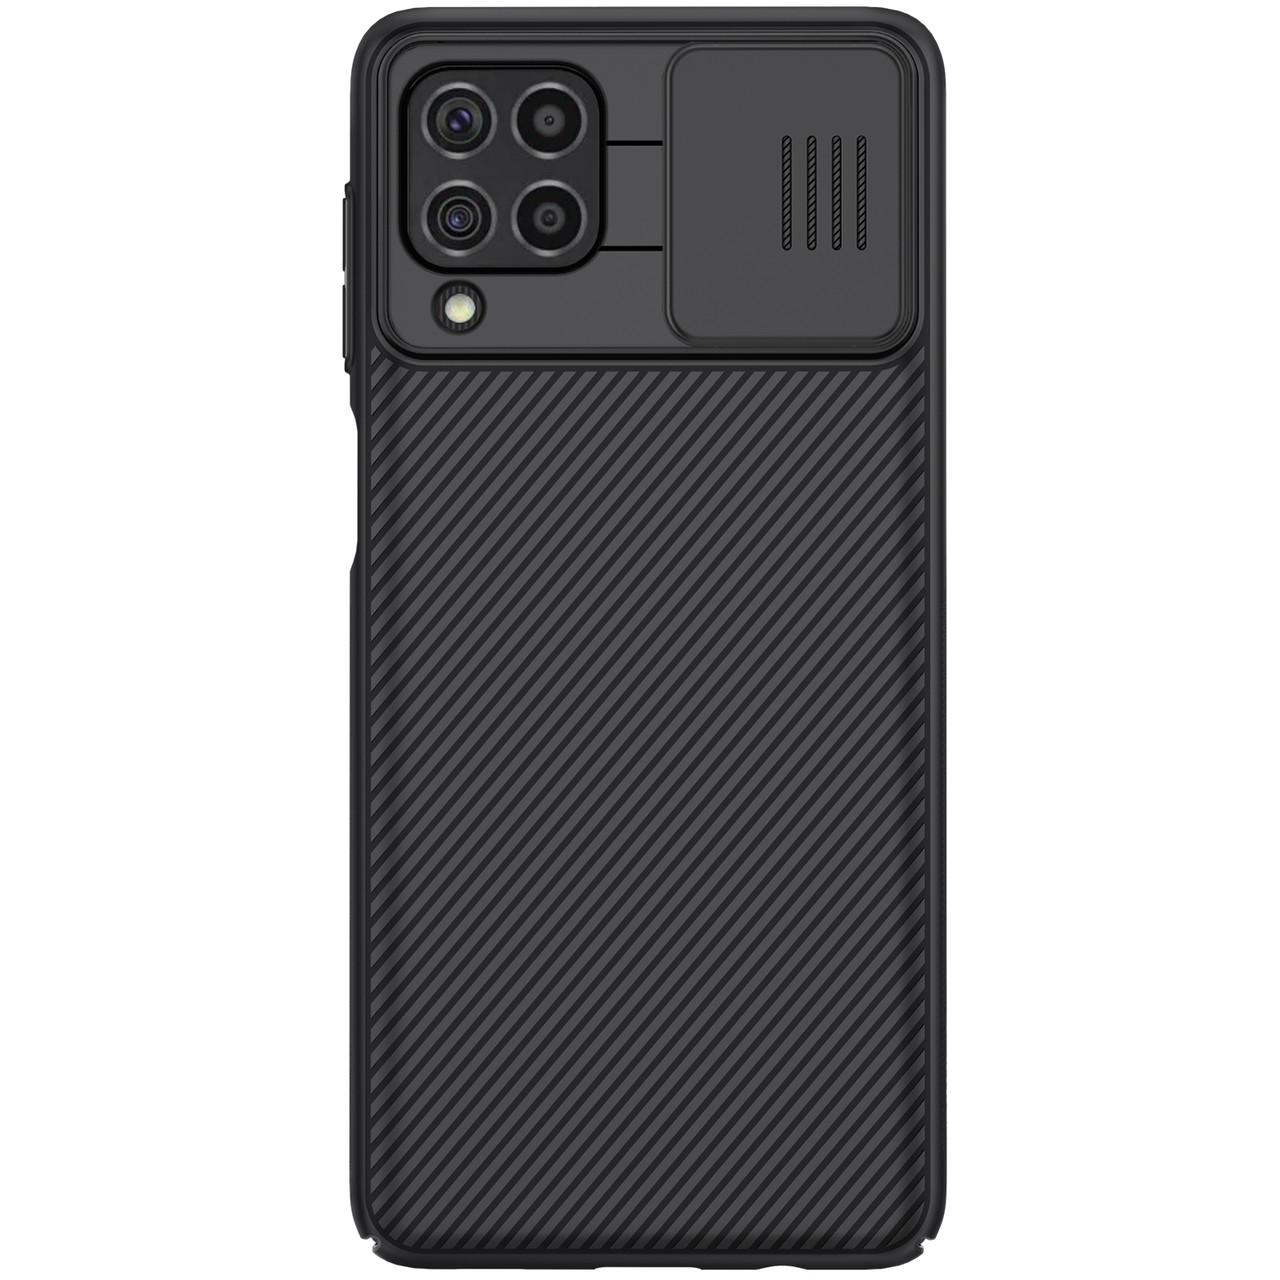 Захисний чохол Nillkin для Samsung Galaxy F62 / M62 (CamShield Pro Case) Black з захистом камери